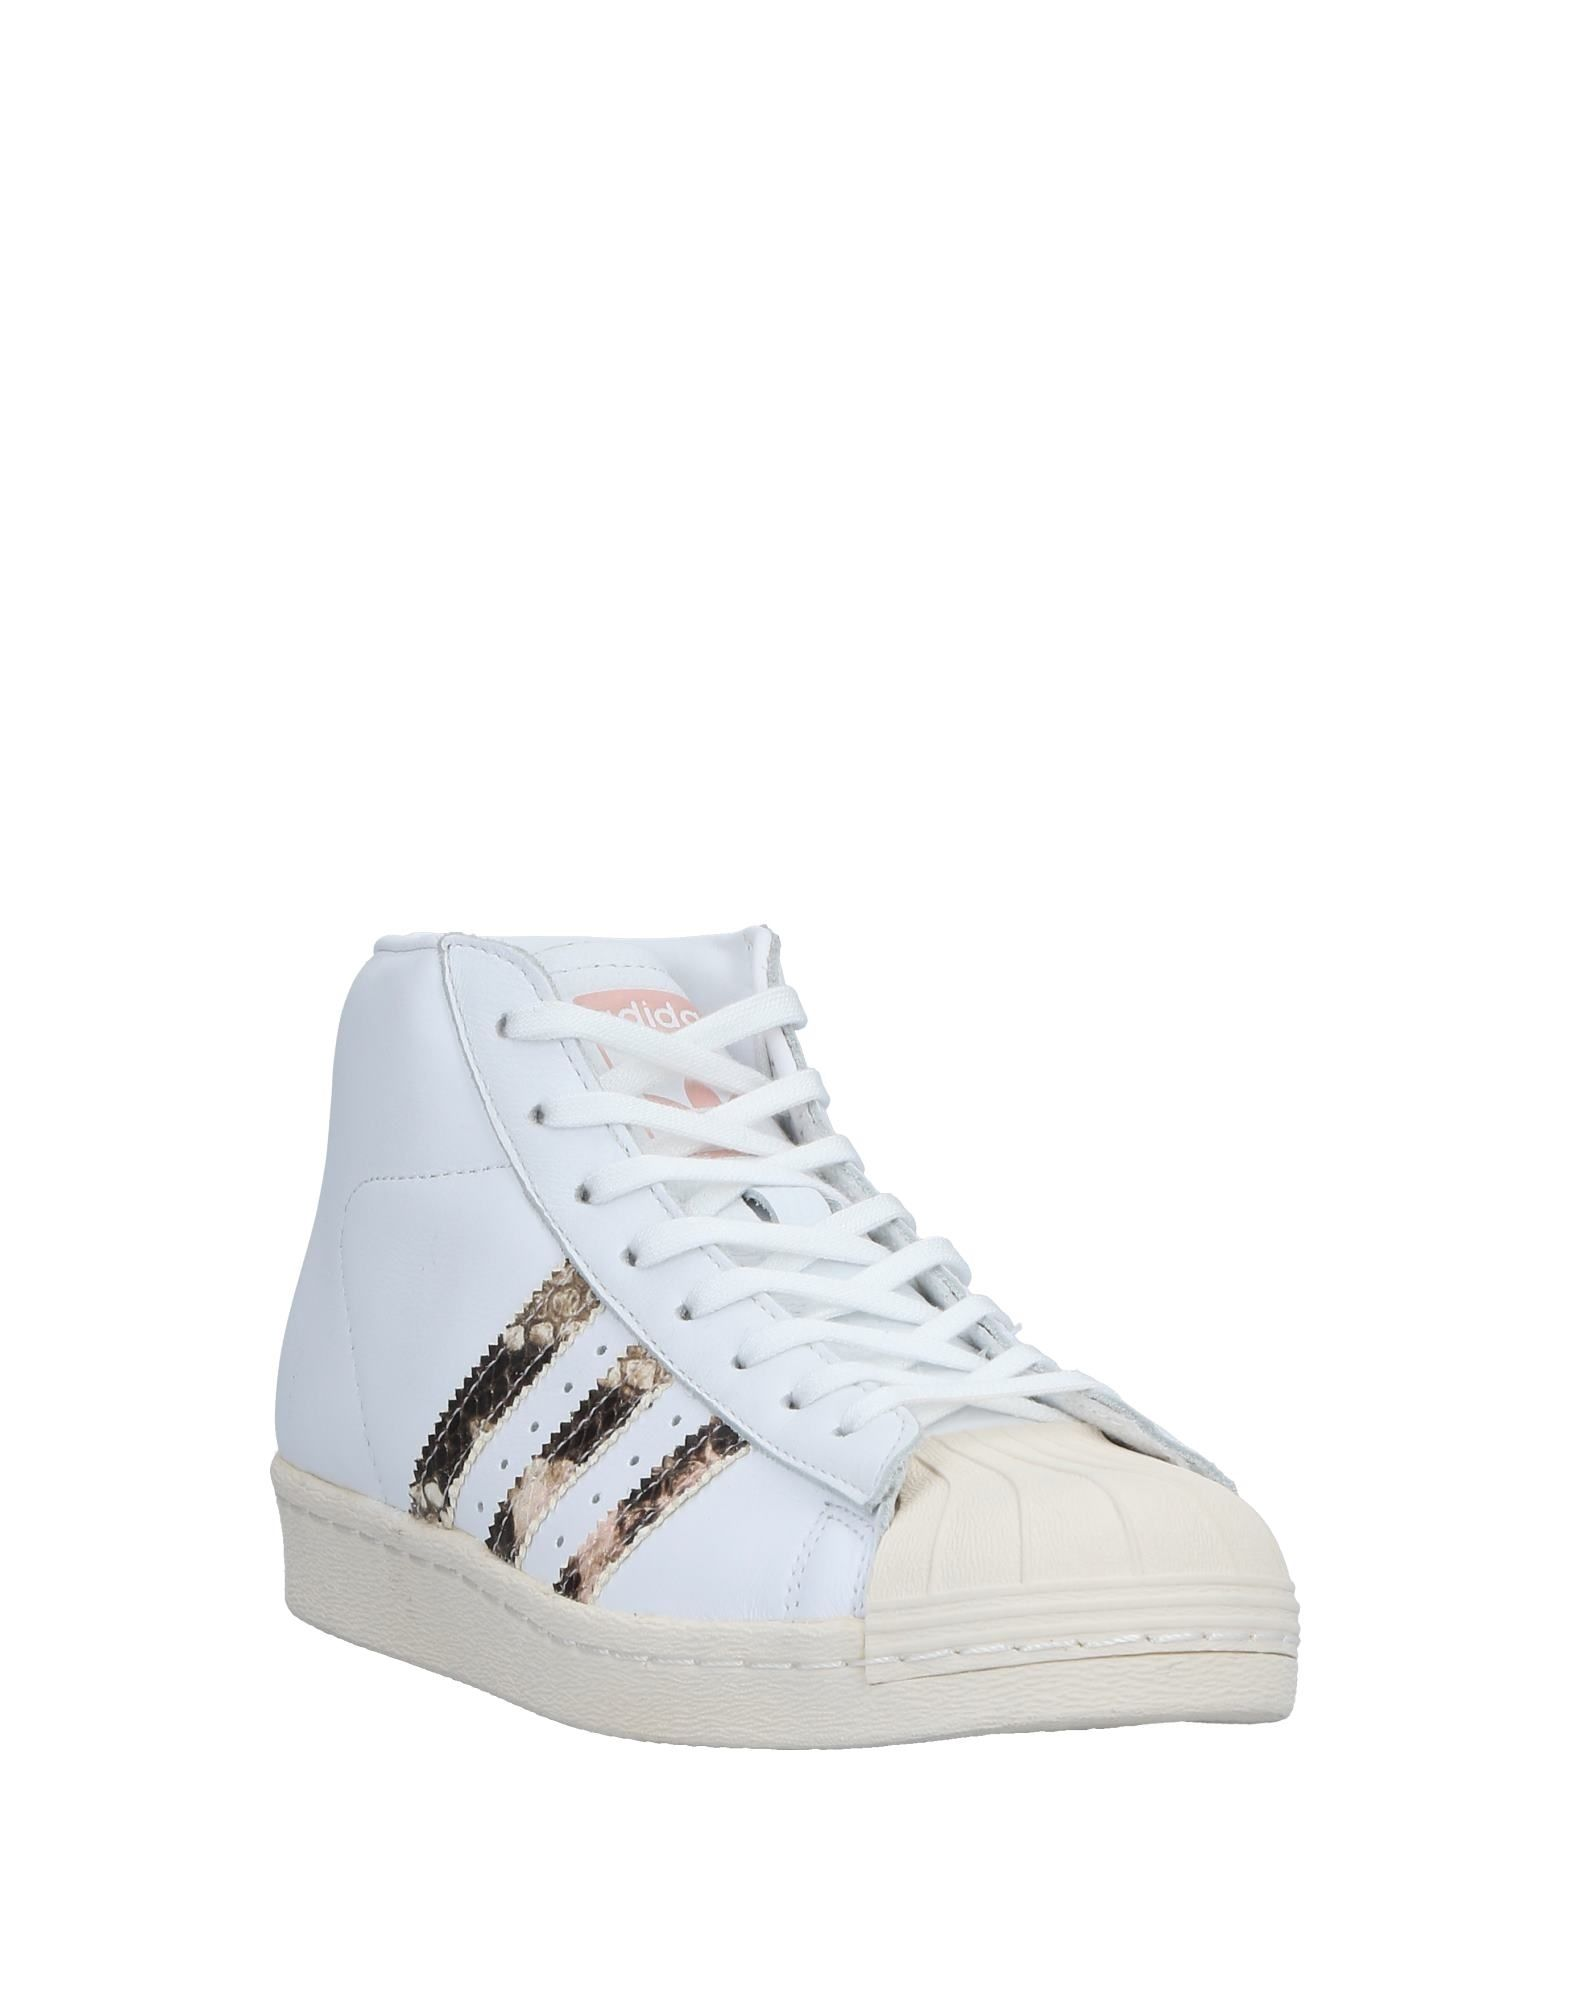 a35ab0f0851 ADIDAS ORIGINALS ΠΑΠΟΥΤΣΙΑ Χαμηλά sneakers, Γυναικεία sneakers, ΓΥΝΑΙΚΑ    ΠΑΠΟΥΤΣΙΑ   SNEAKERS